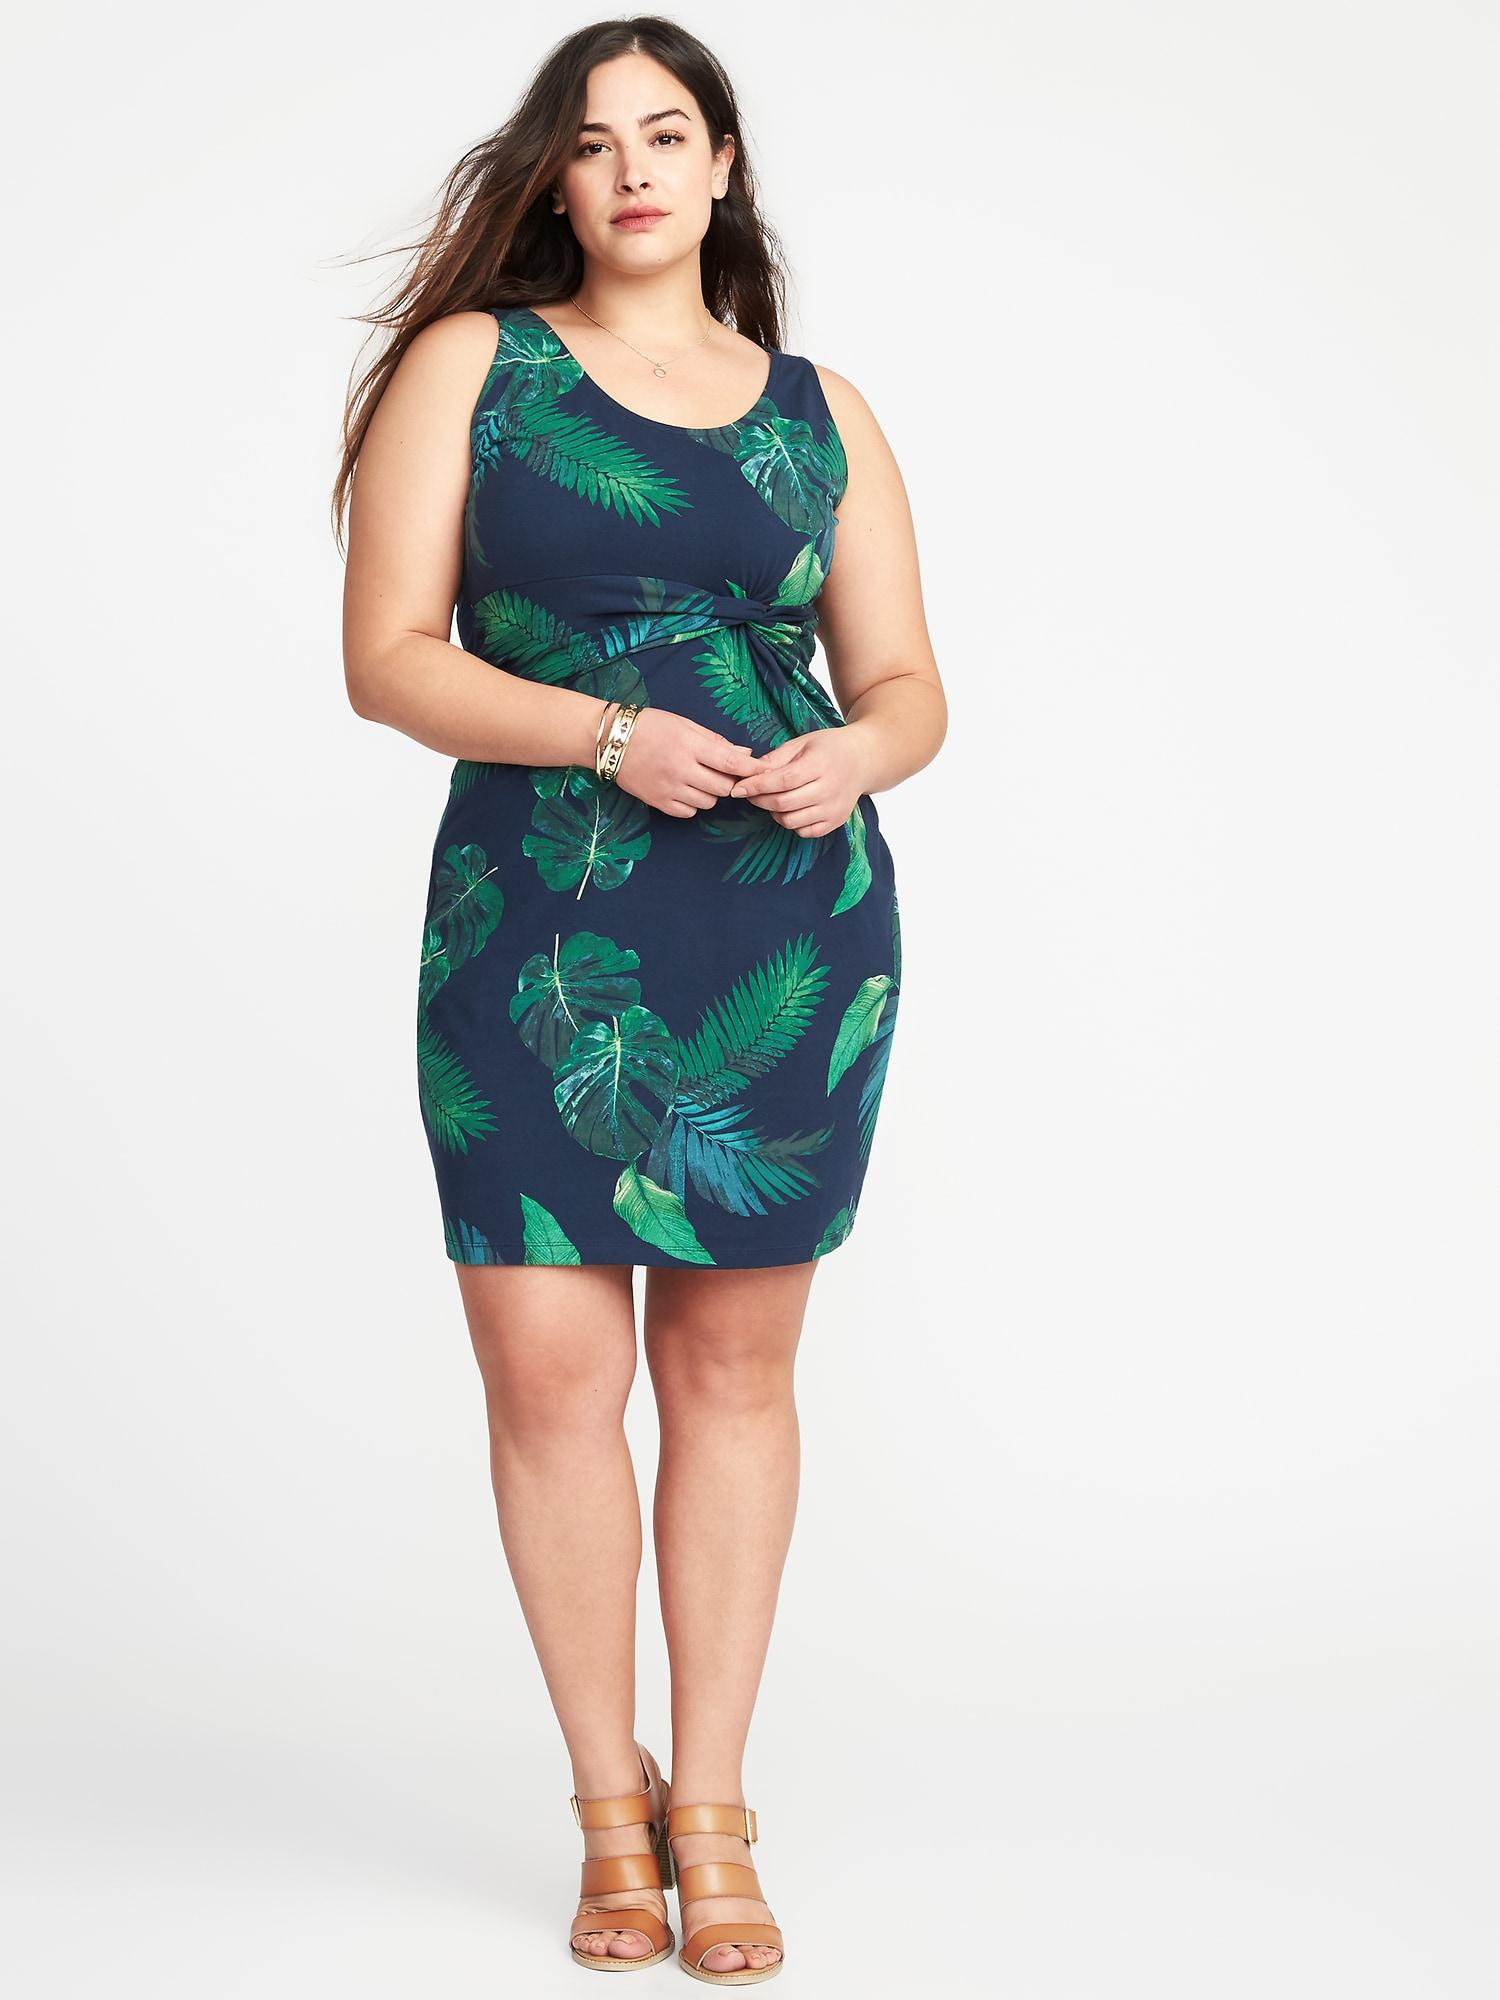 Plus-size Sleeveless Twist-front Bodycon Dress